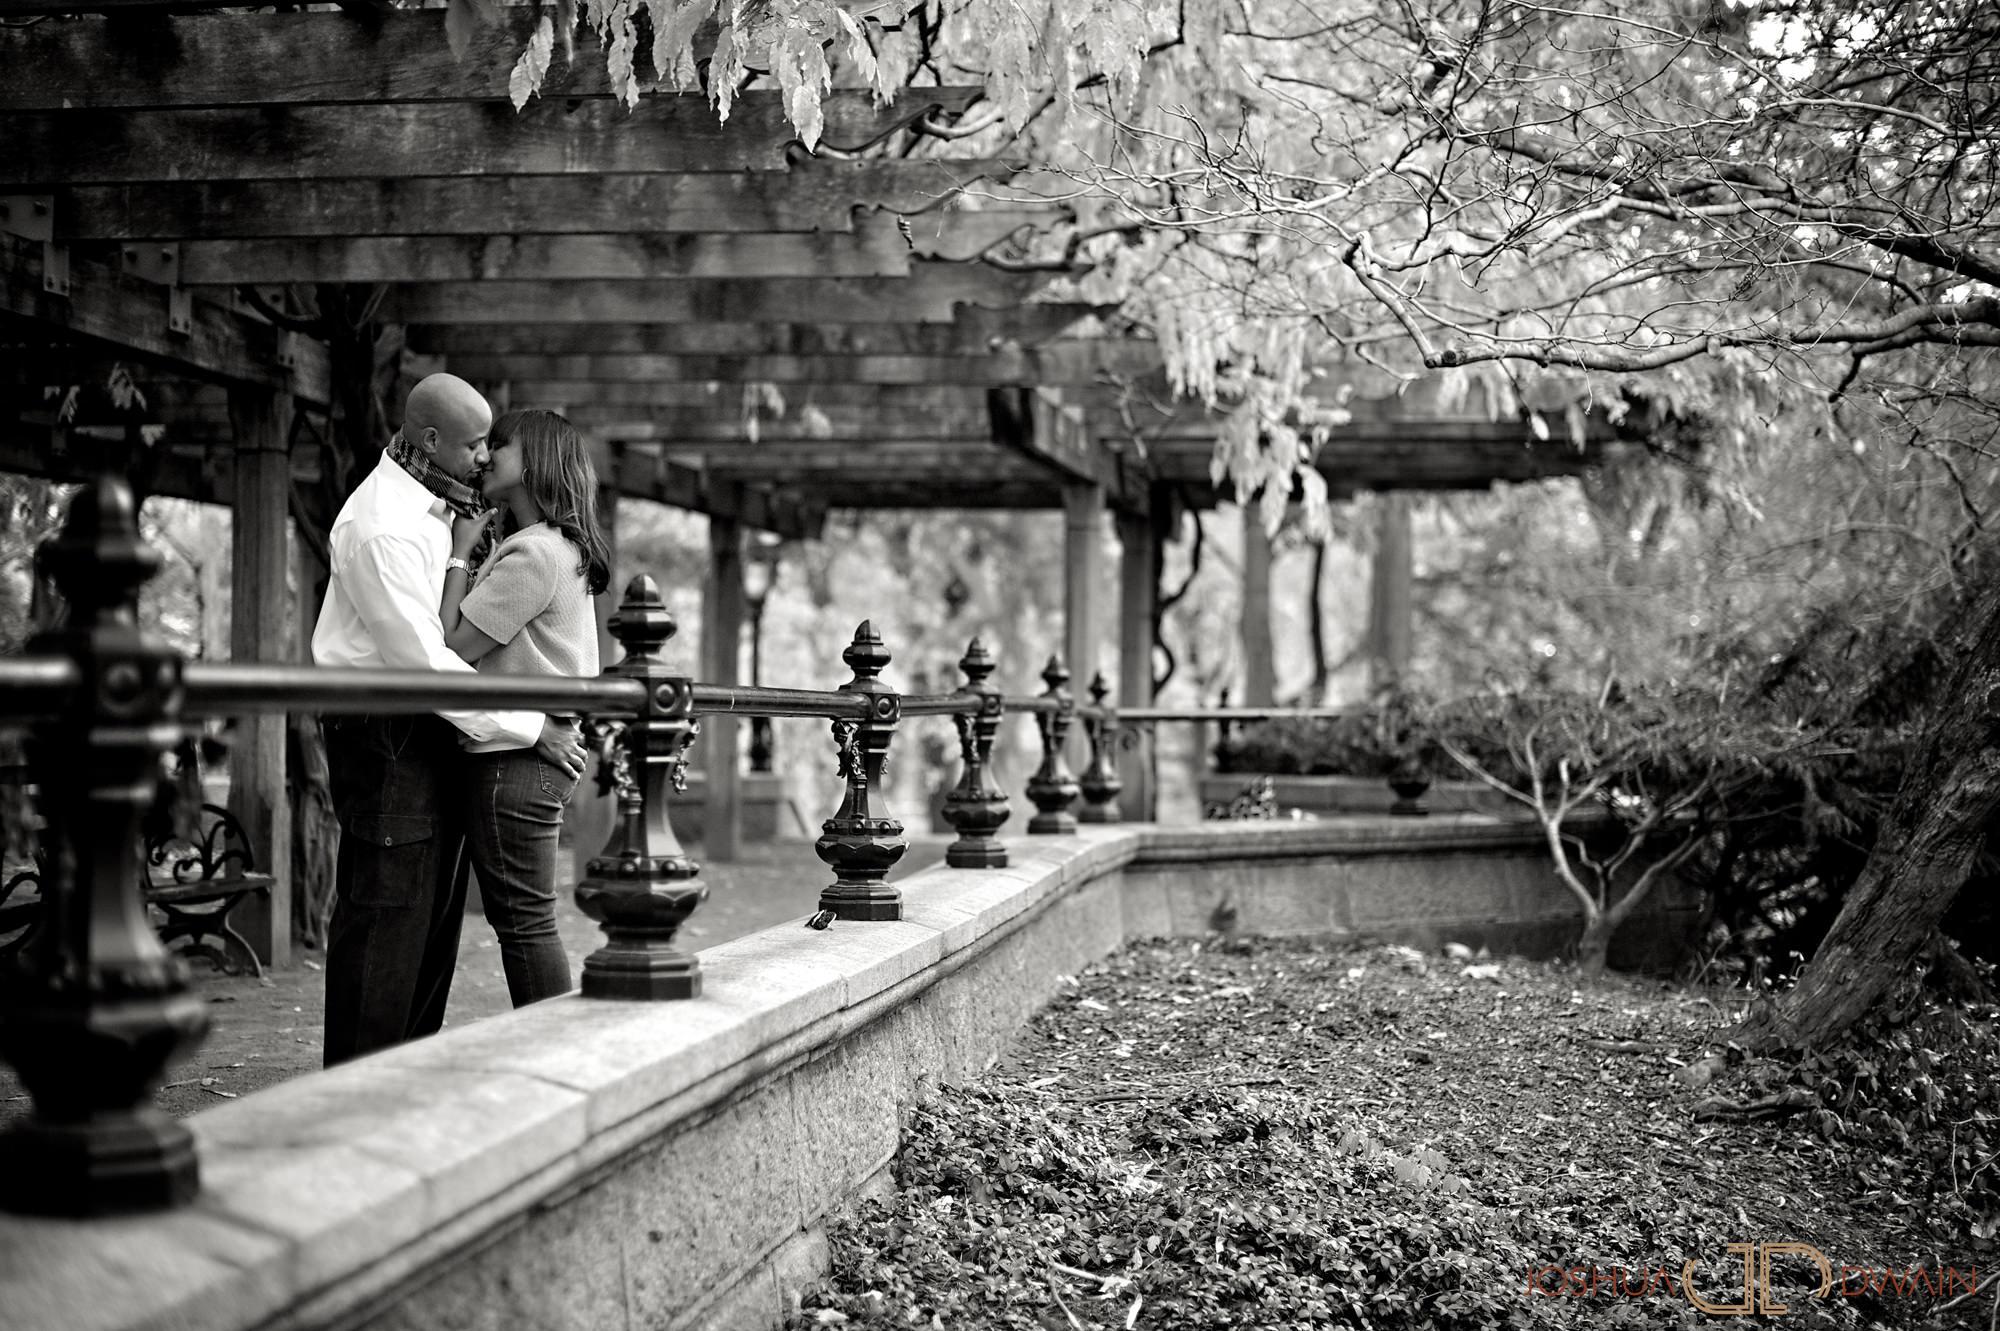 carol-shiloh-003-central-park-new-york-city-engagement-photographer-joshua-dwain-06